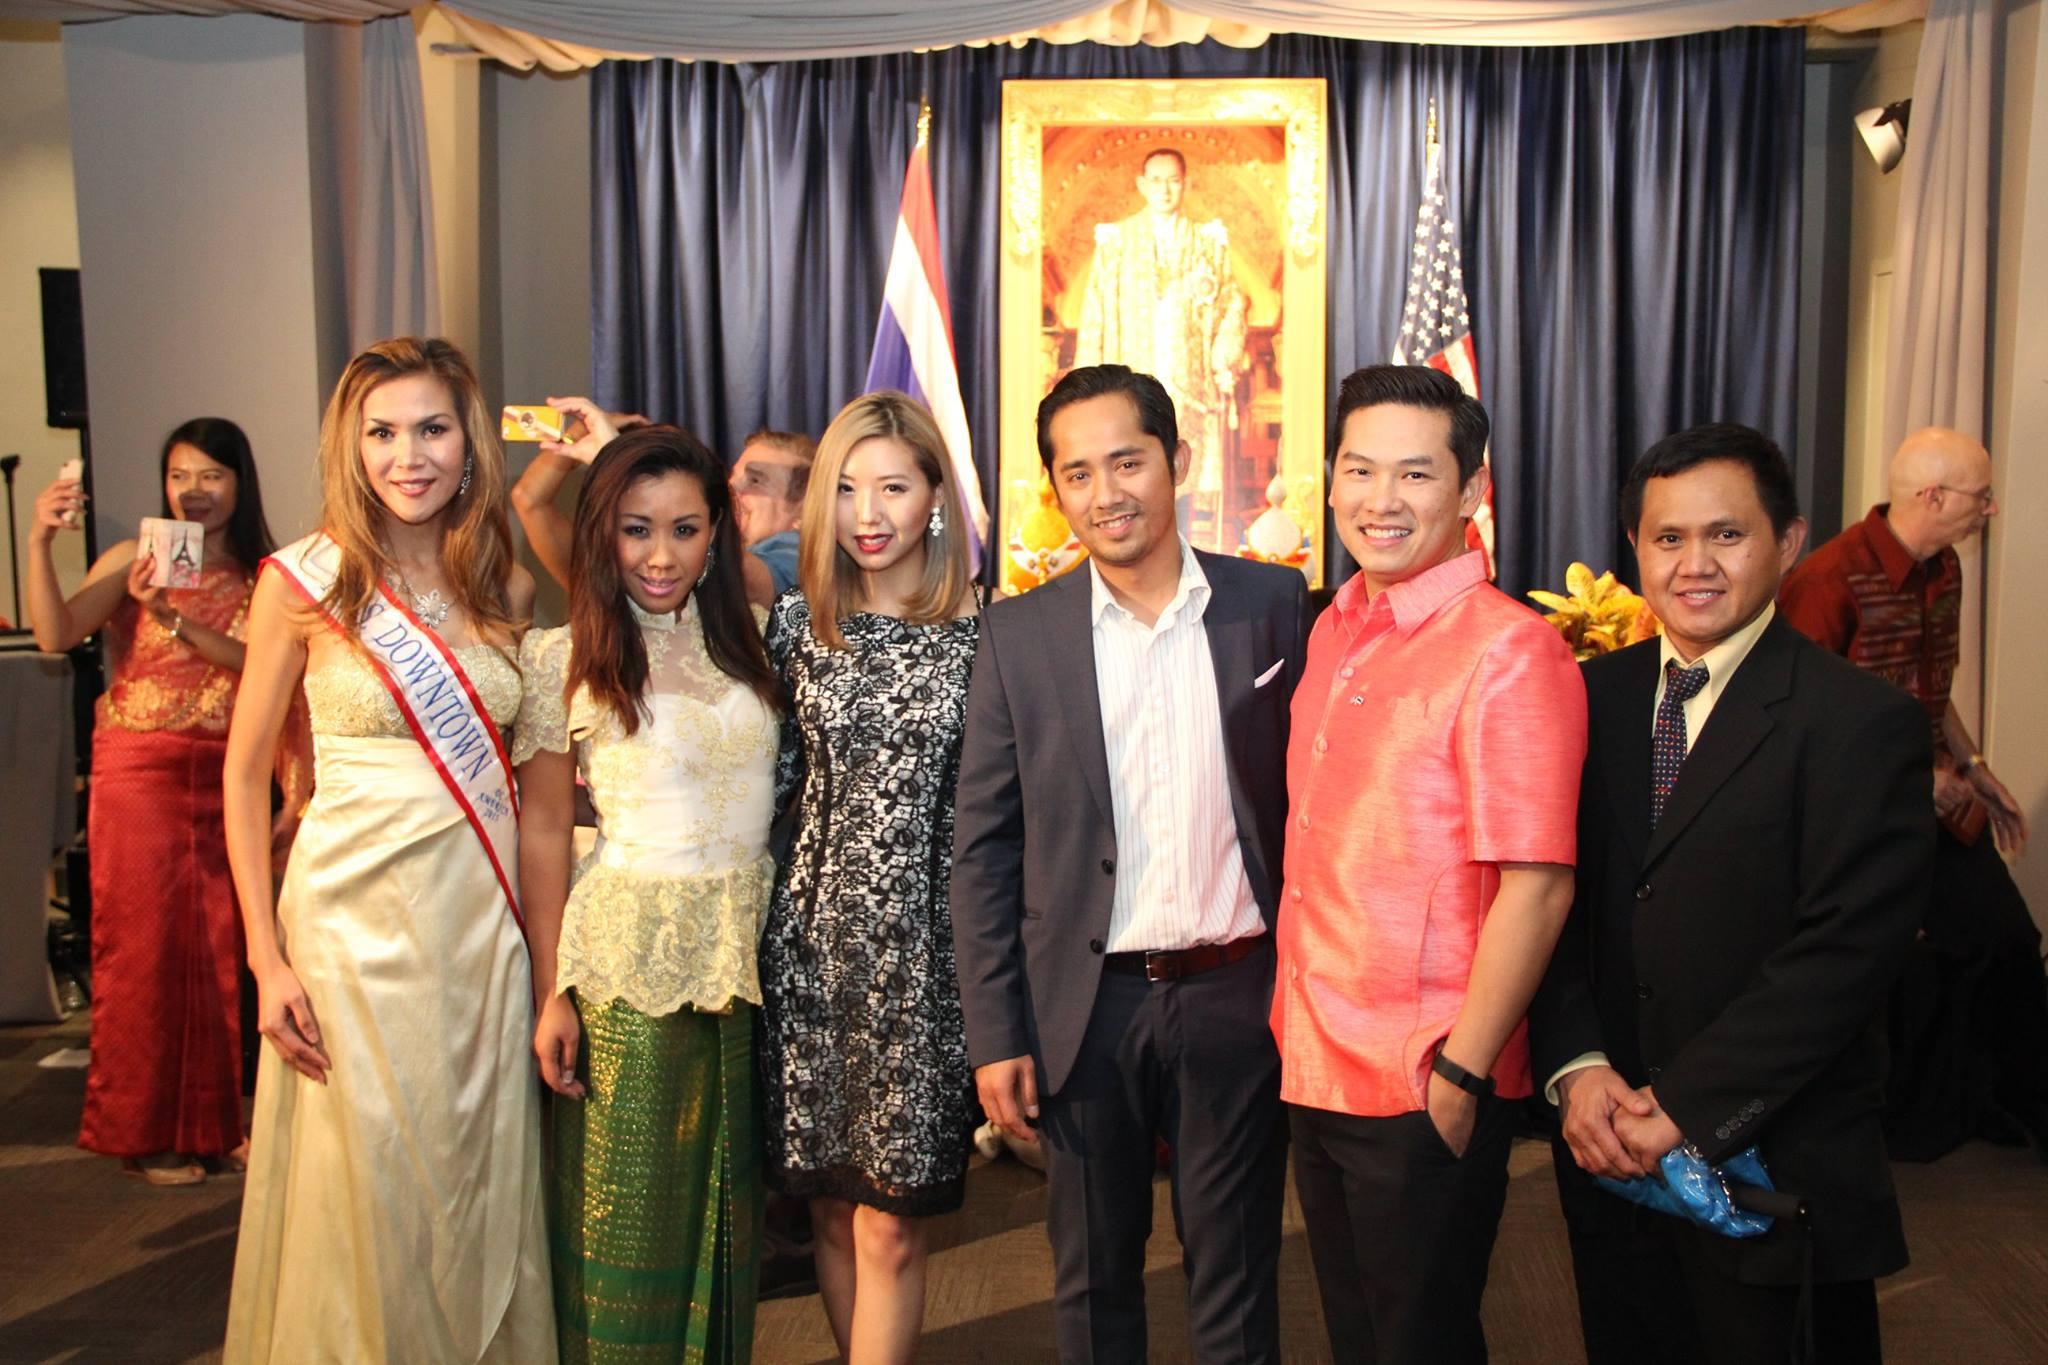 Celebrating HM King of Thailand